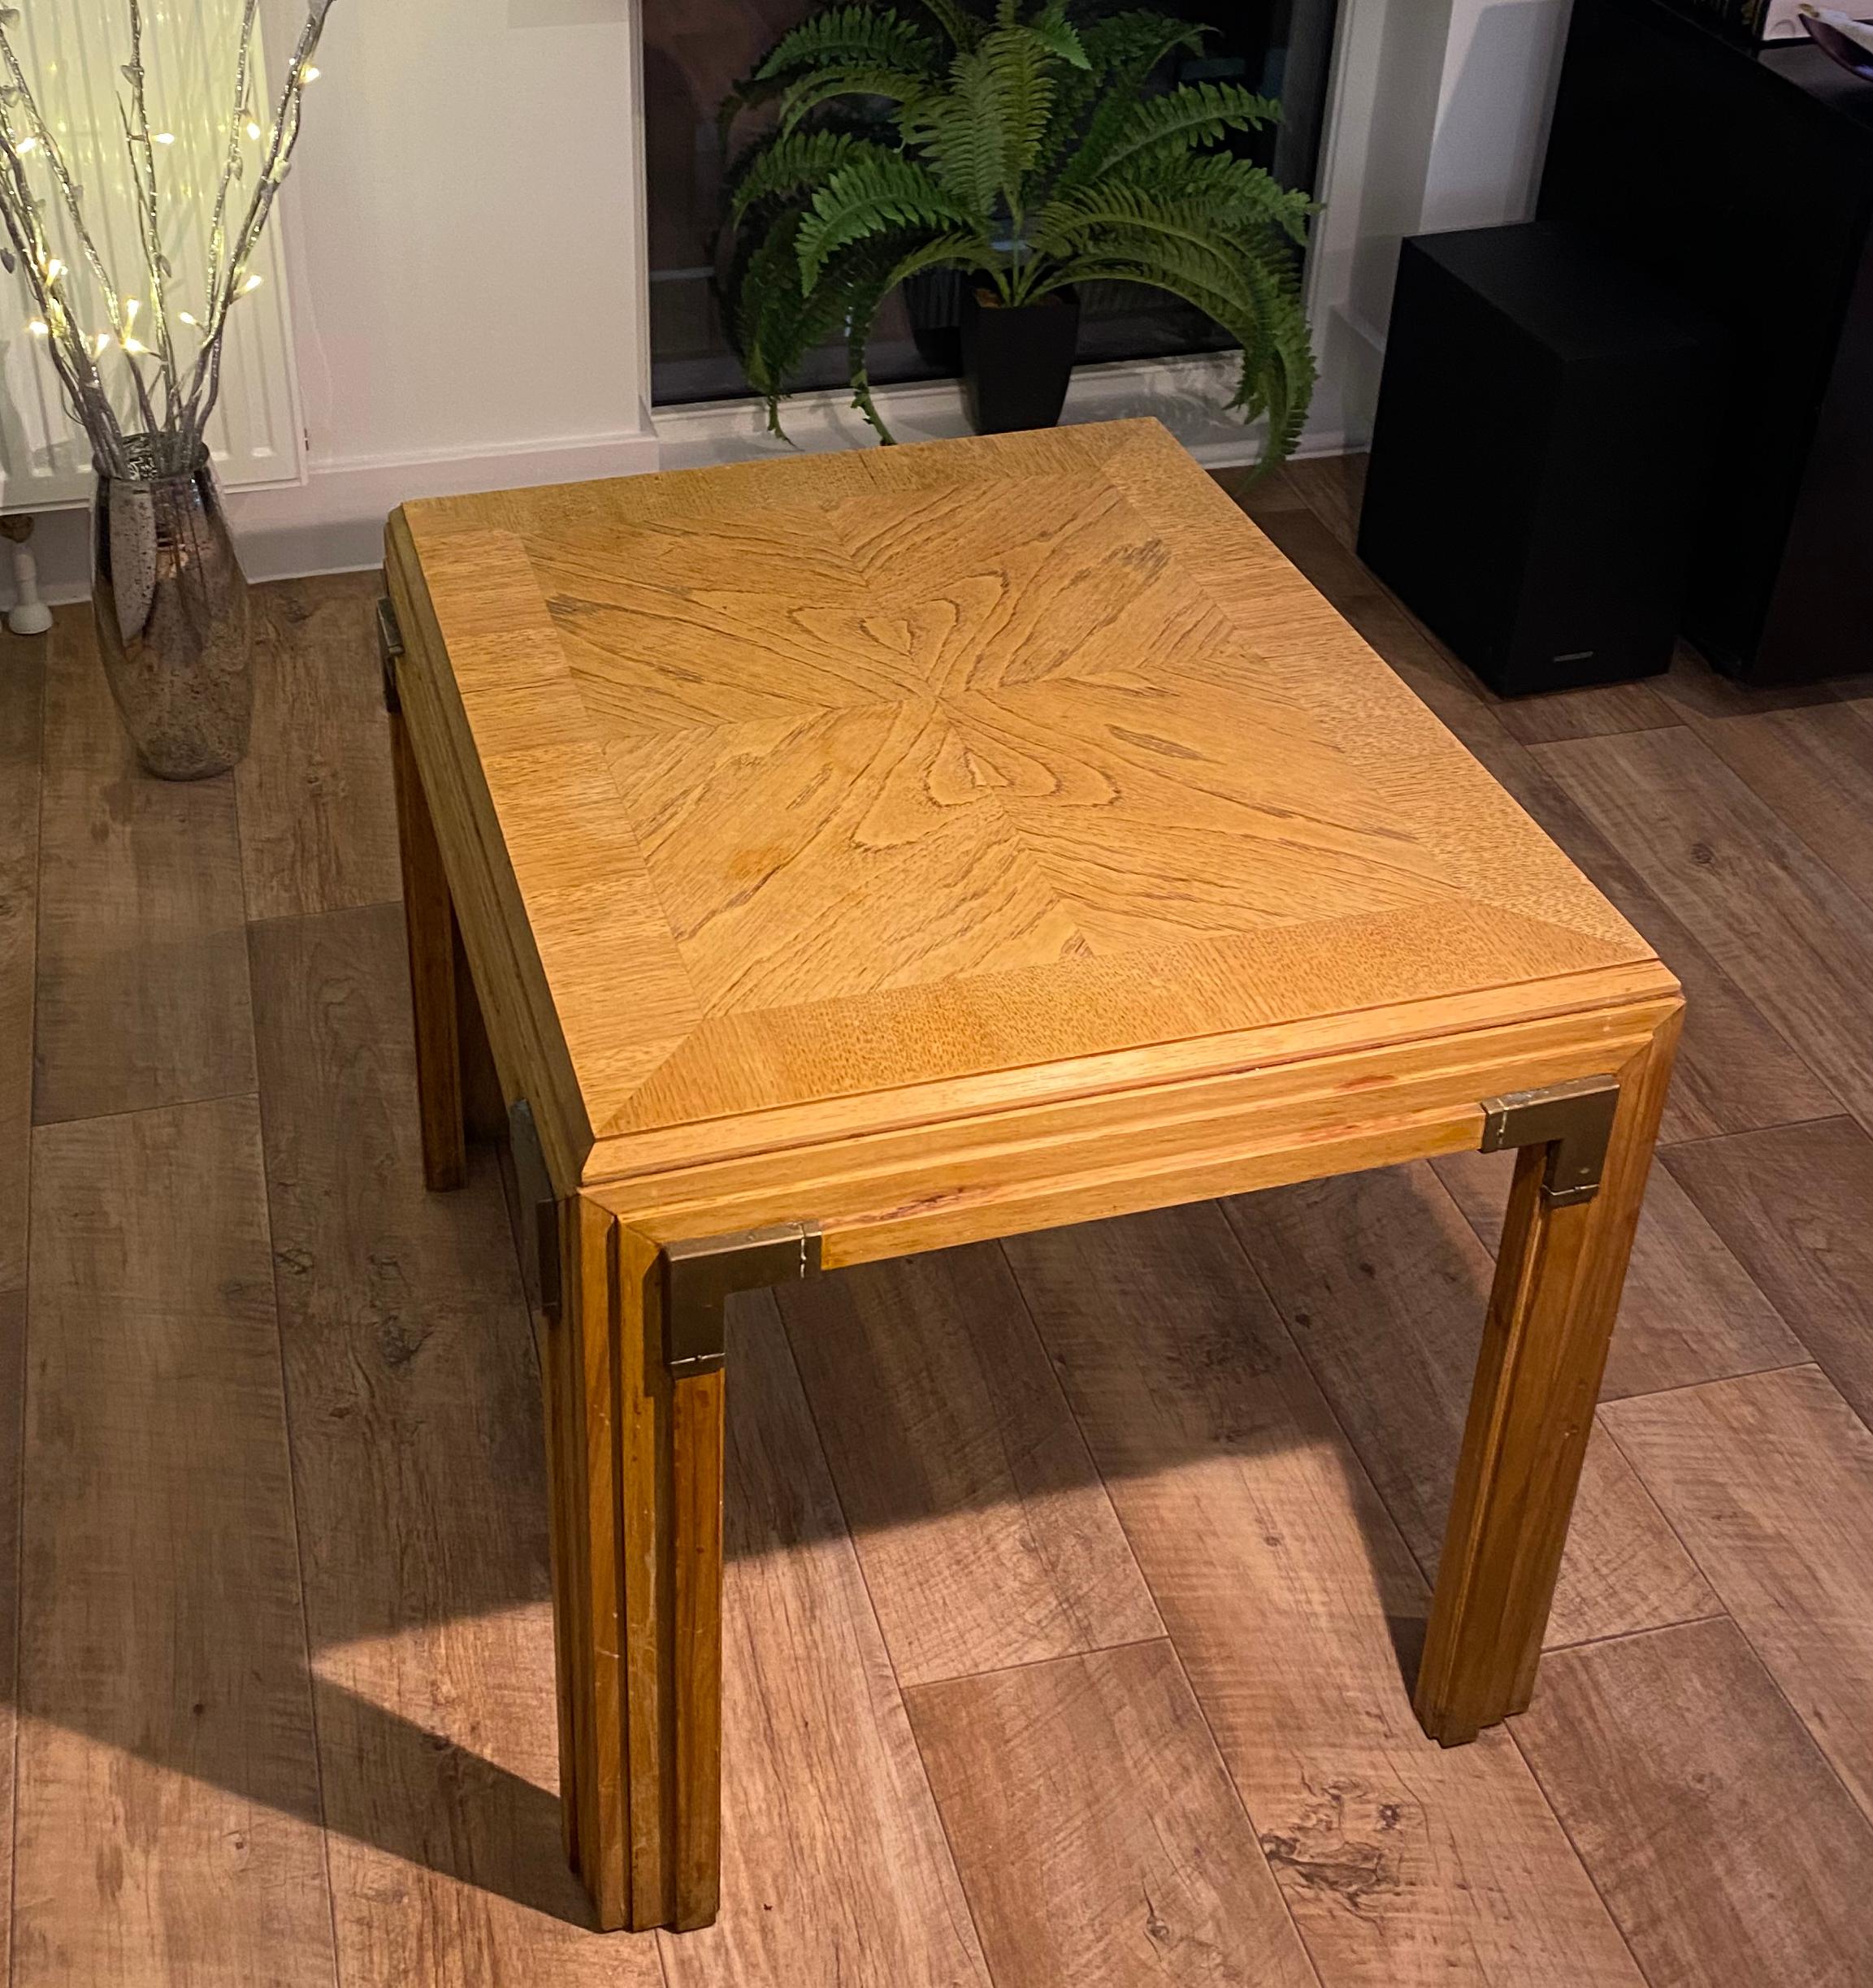 Custom made nested tables